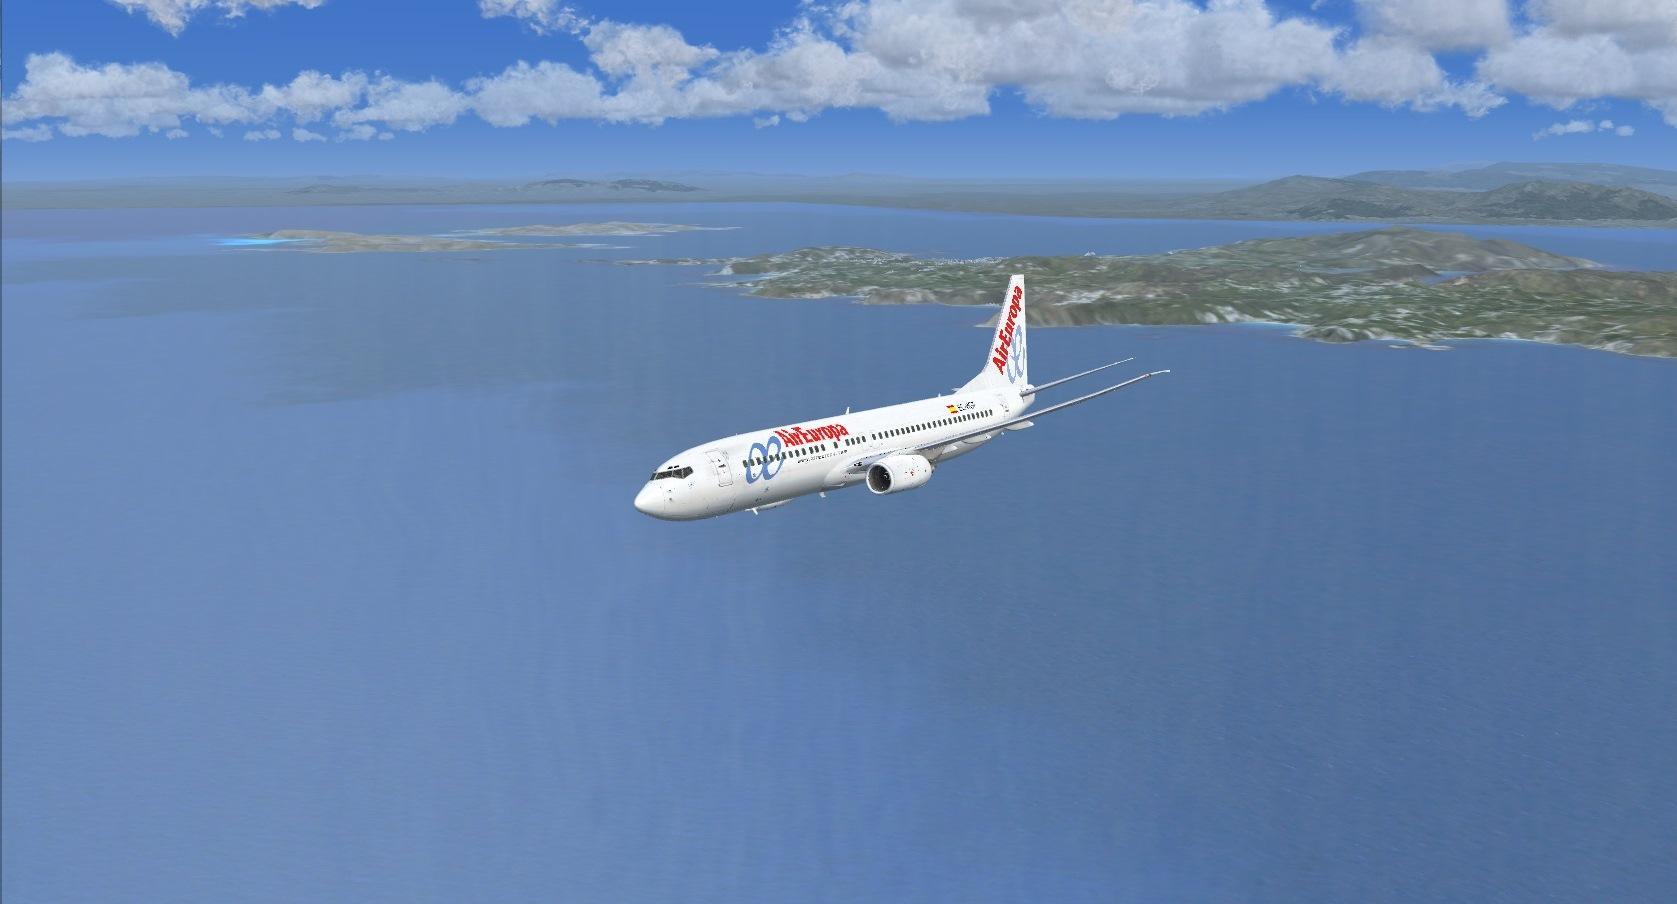 First landing Mykonos 8840930787_9d77ffac83_o